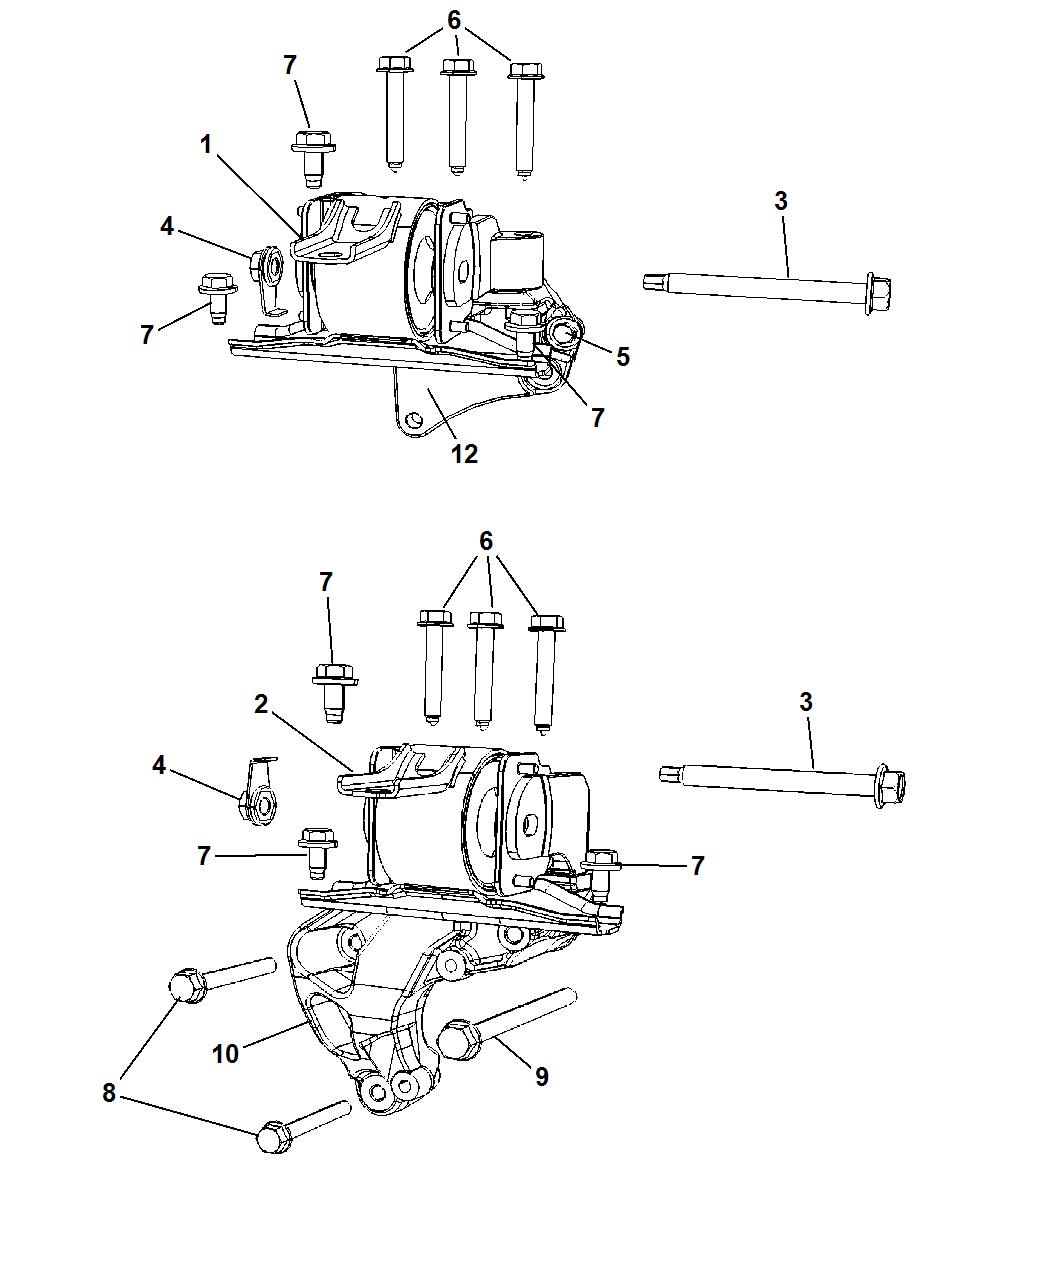 AZ_8996] 2007 Dodge Caliber Engine Mounts Diagram Download DiagramLukep Pala Leona Ntnes Mohammedshrine Librar Wiring 101